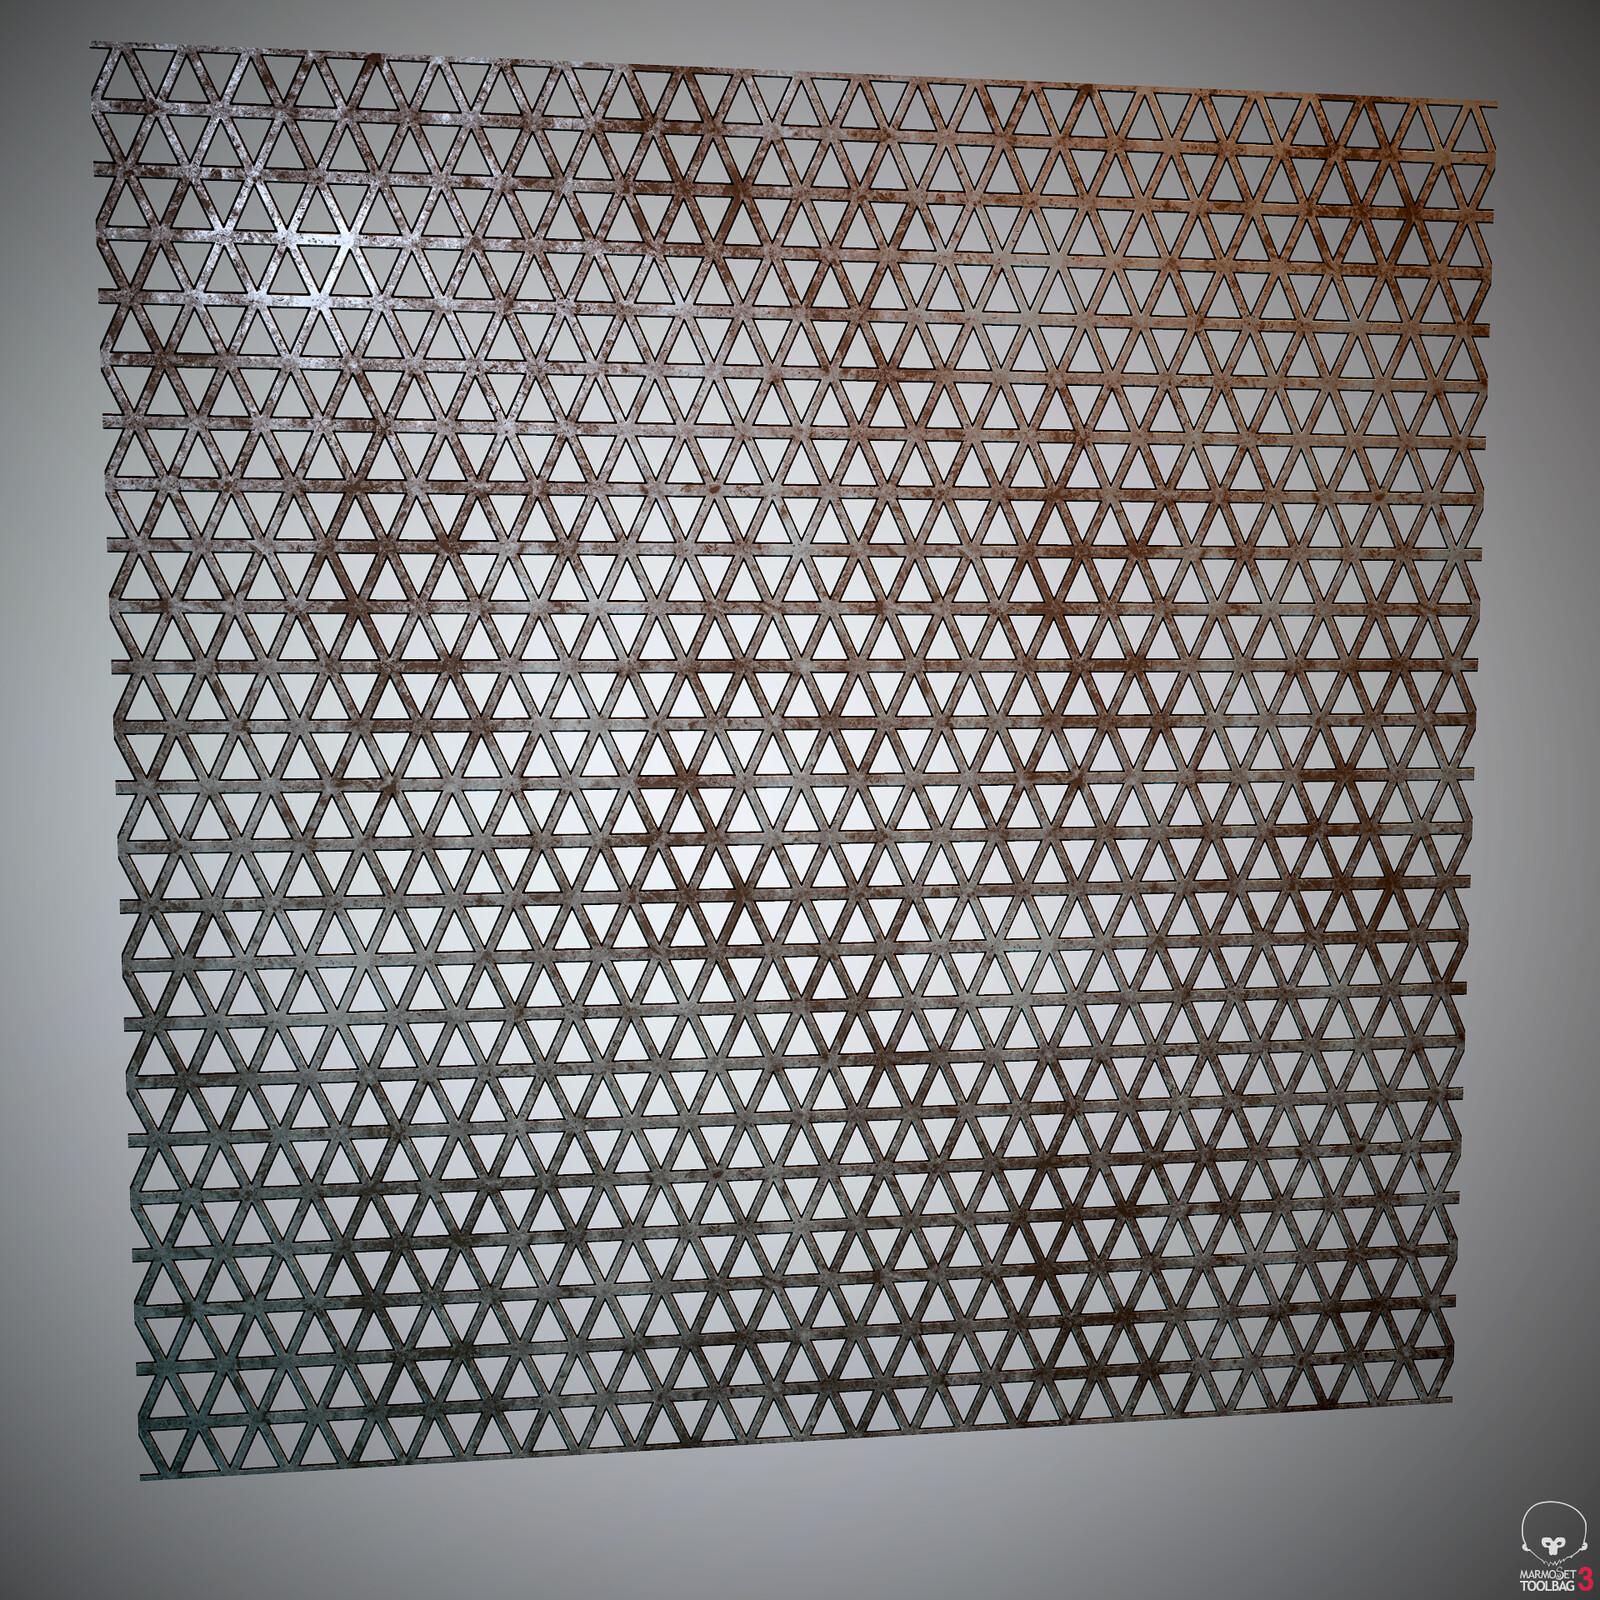 Floor grate, rendered in Marmost